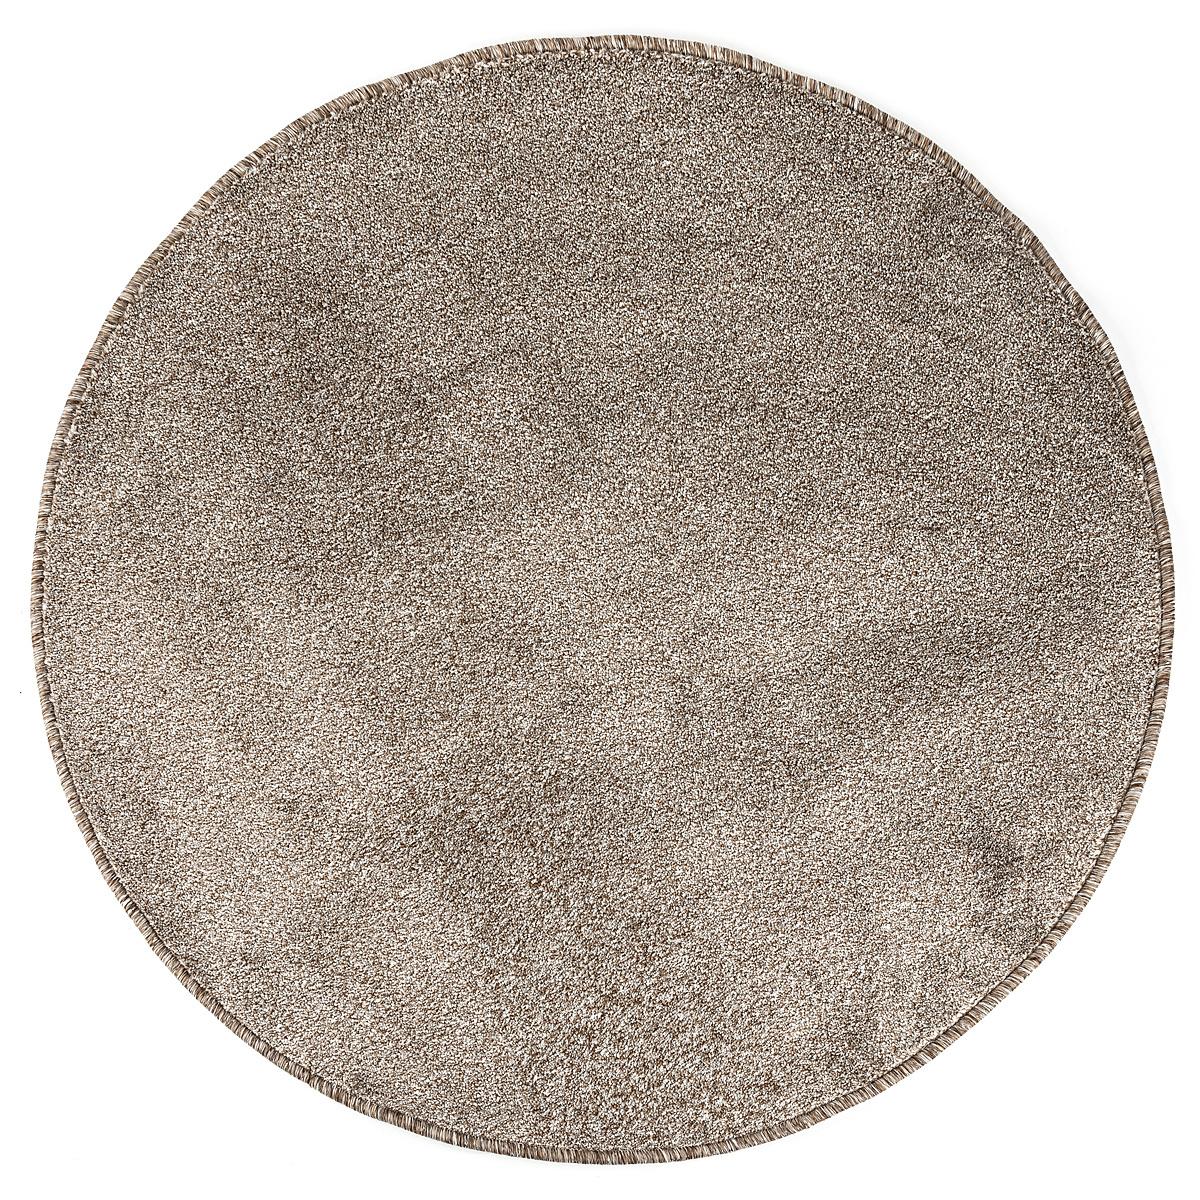 Vopi Kusový koberec Apollo soft béžová, 120 cm